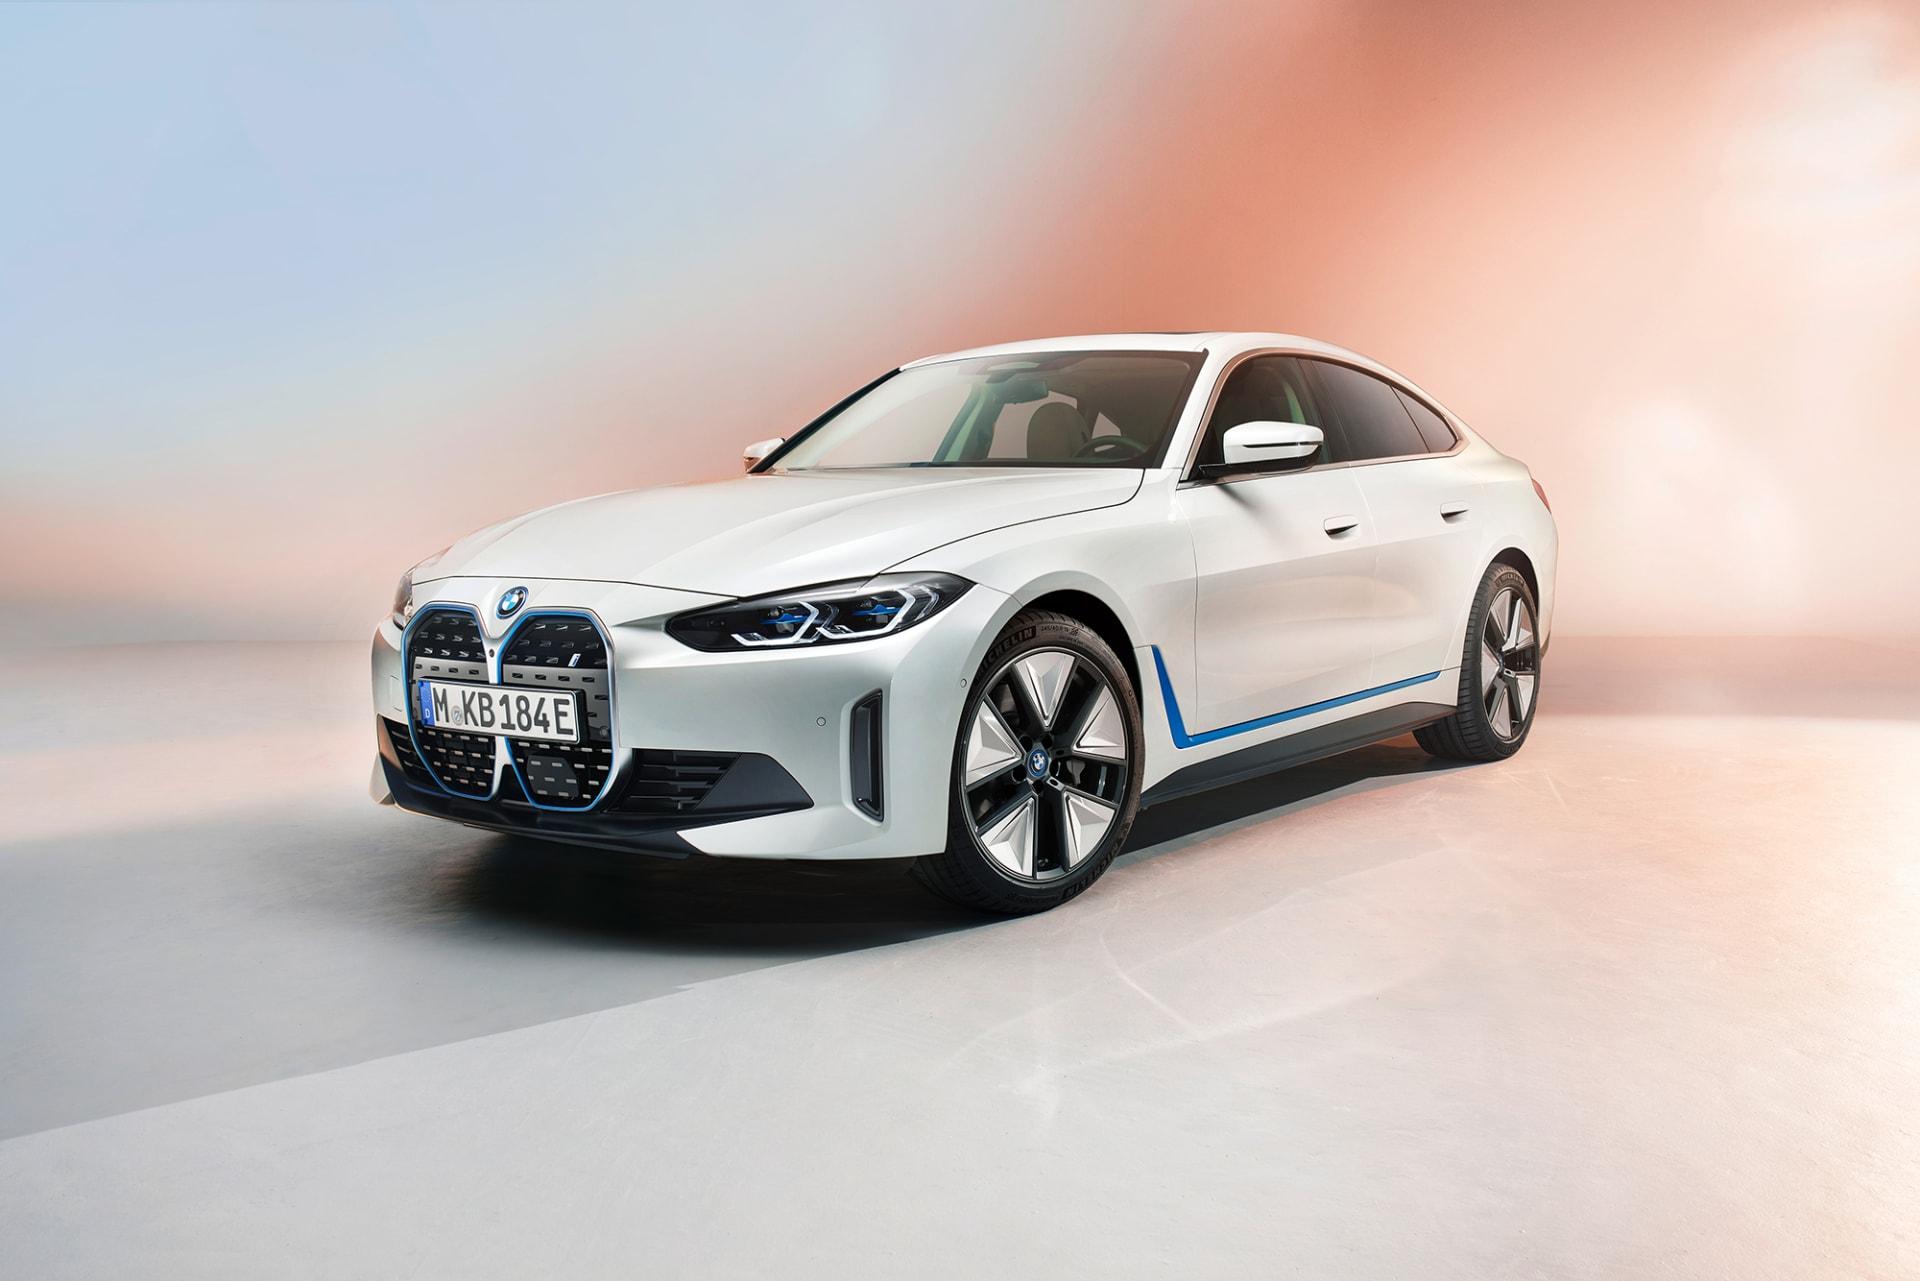 BMW تكشف عن سيارة كهربائية جديدة.. وتؤكد: لن نتخلى عن سيارات الوقود قريباً